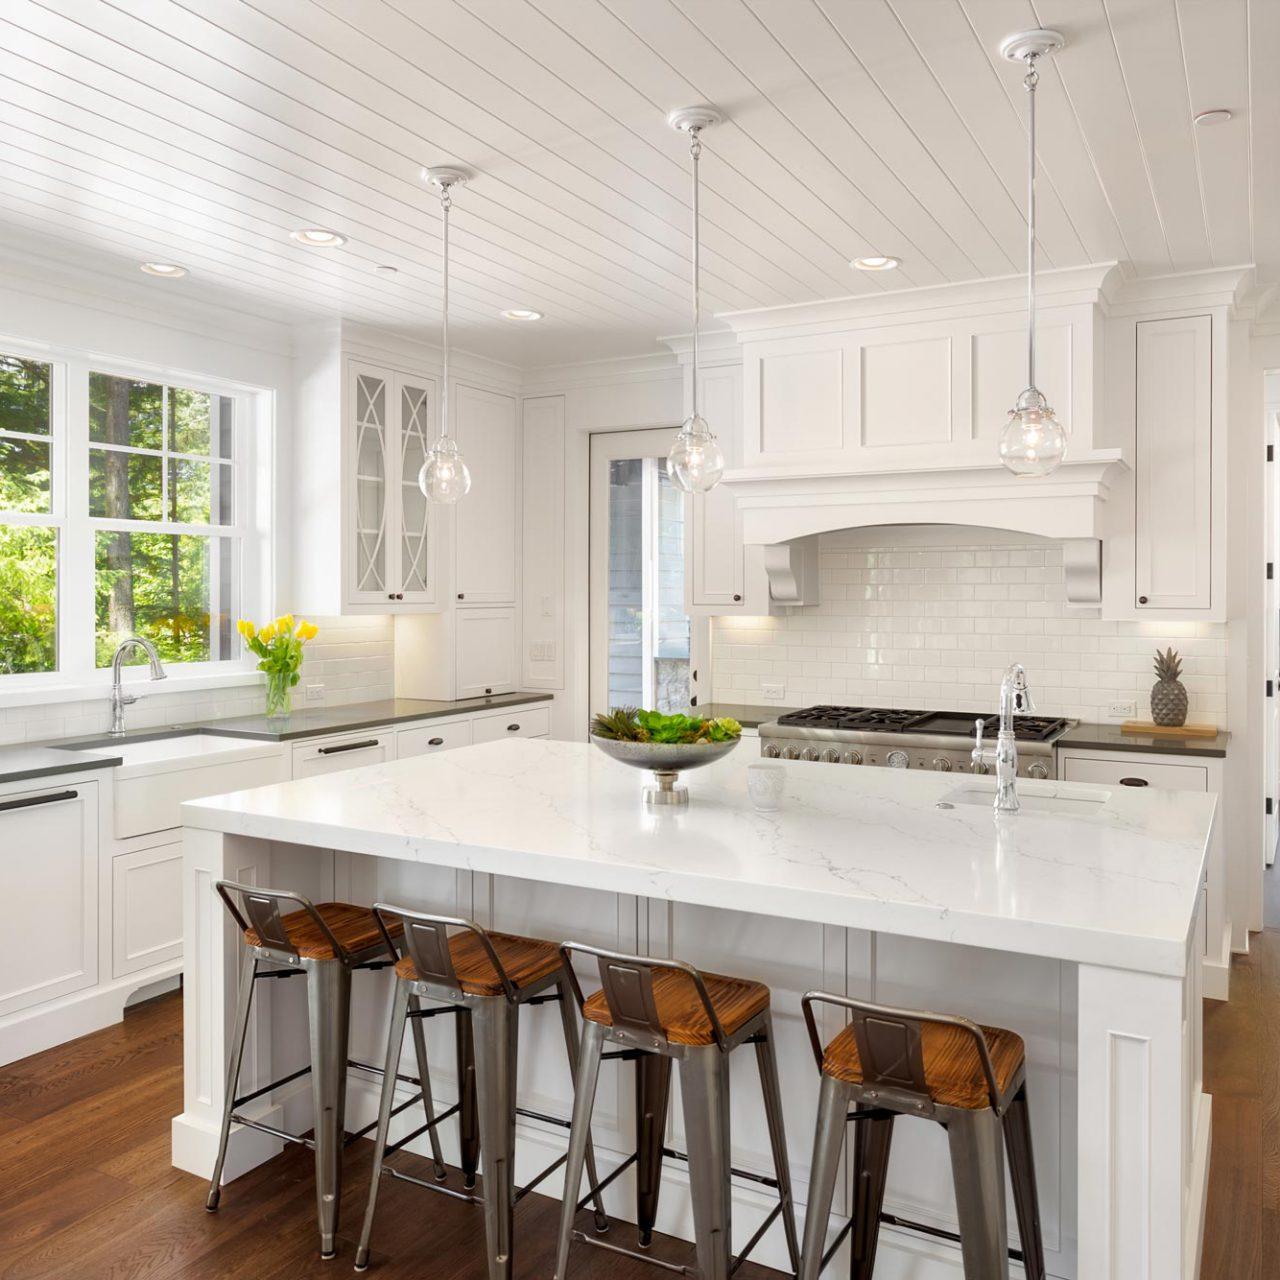 https://builtrightny.com/wp-content/uploads/2020/03/kitchen1-1280x1280.jpg